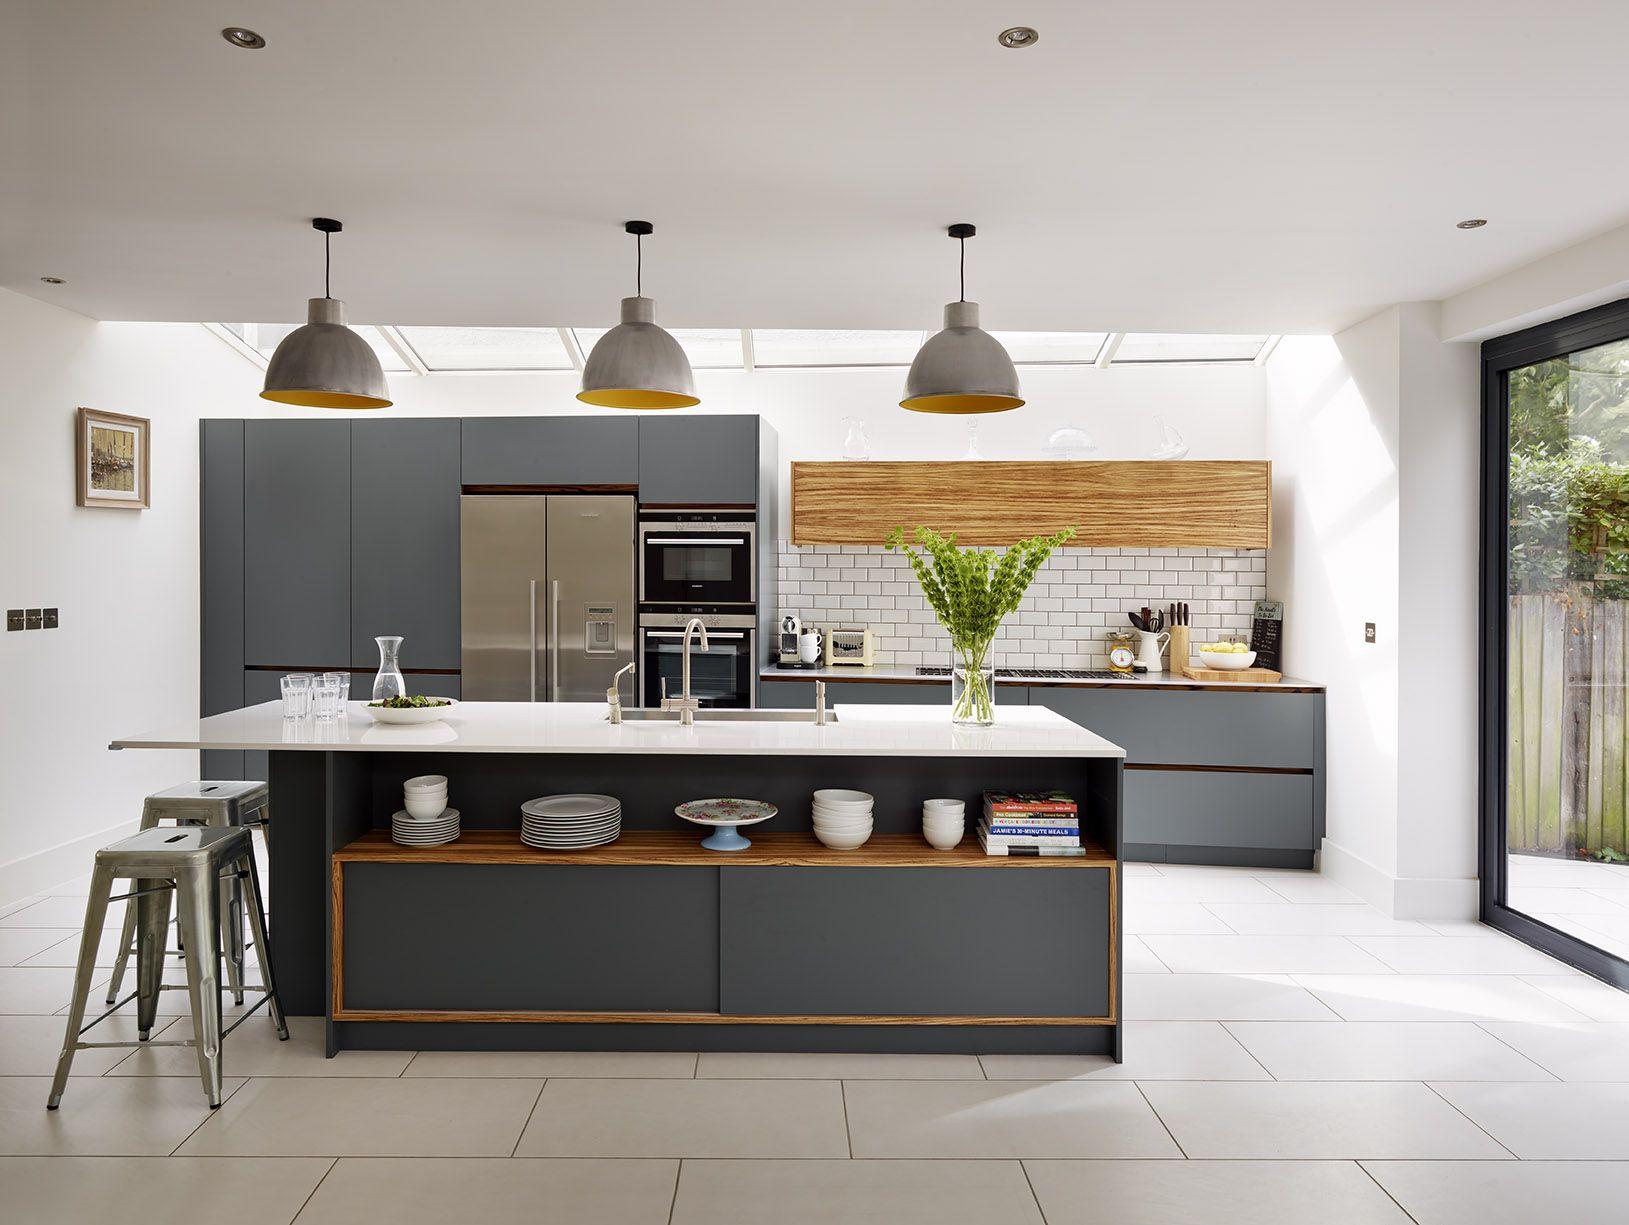 Roundhouse Urbo bespoke kitchen Contemporary kitchen